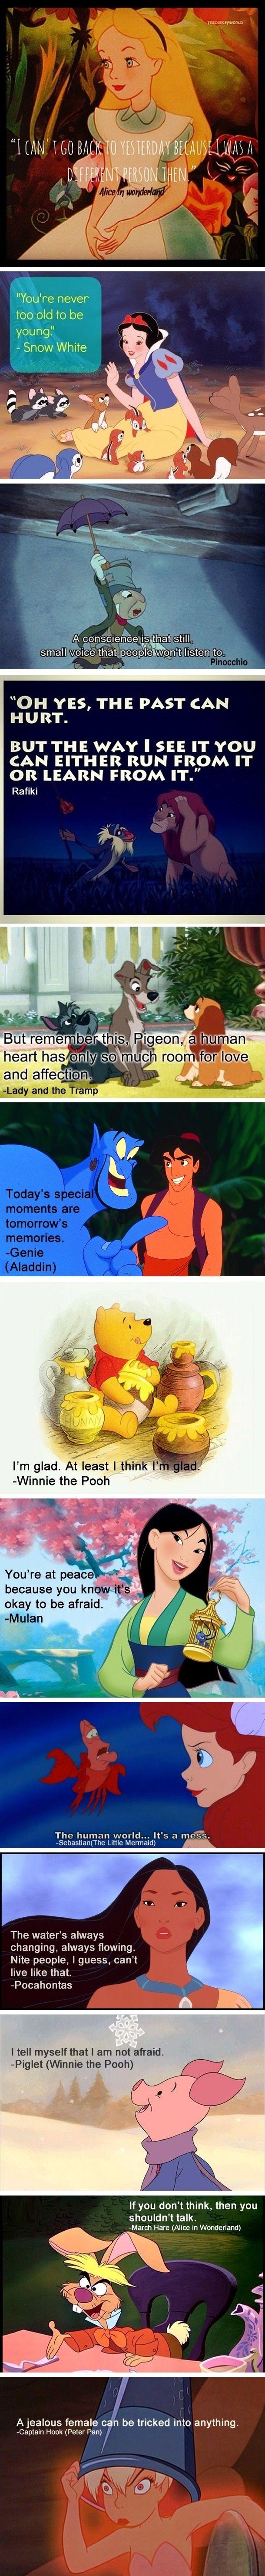 Disney Movies Quotes - MISCONTEXTUALIZATION!!!!